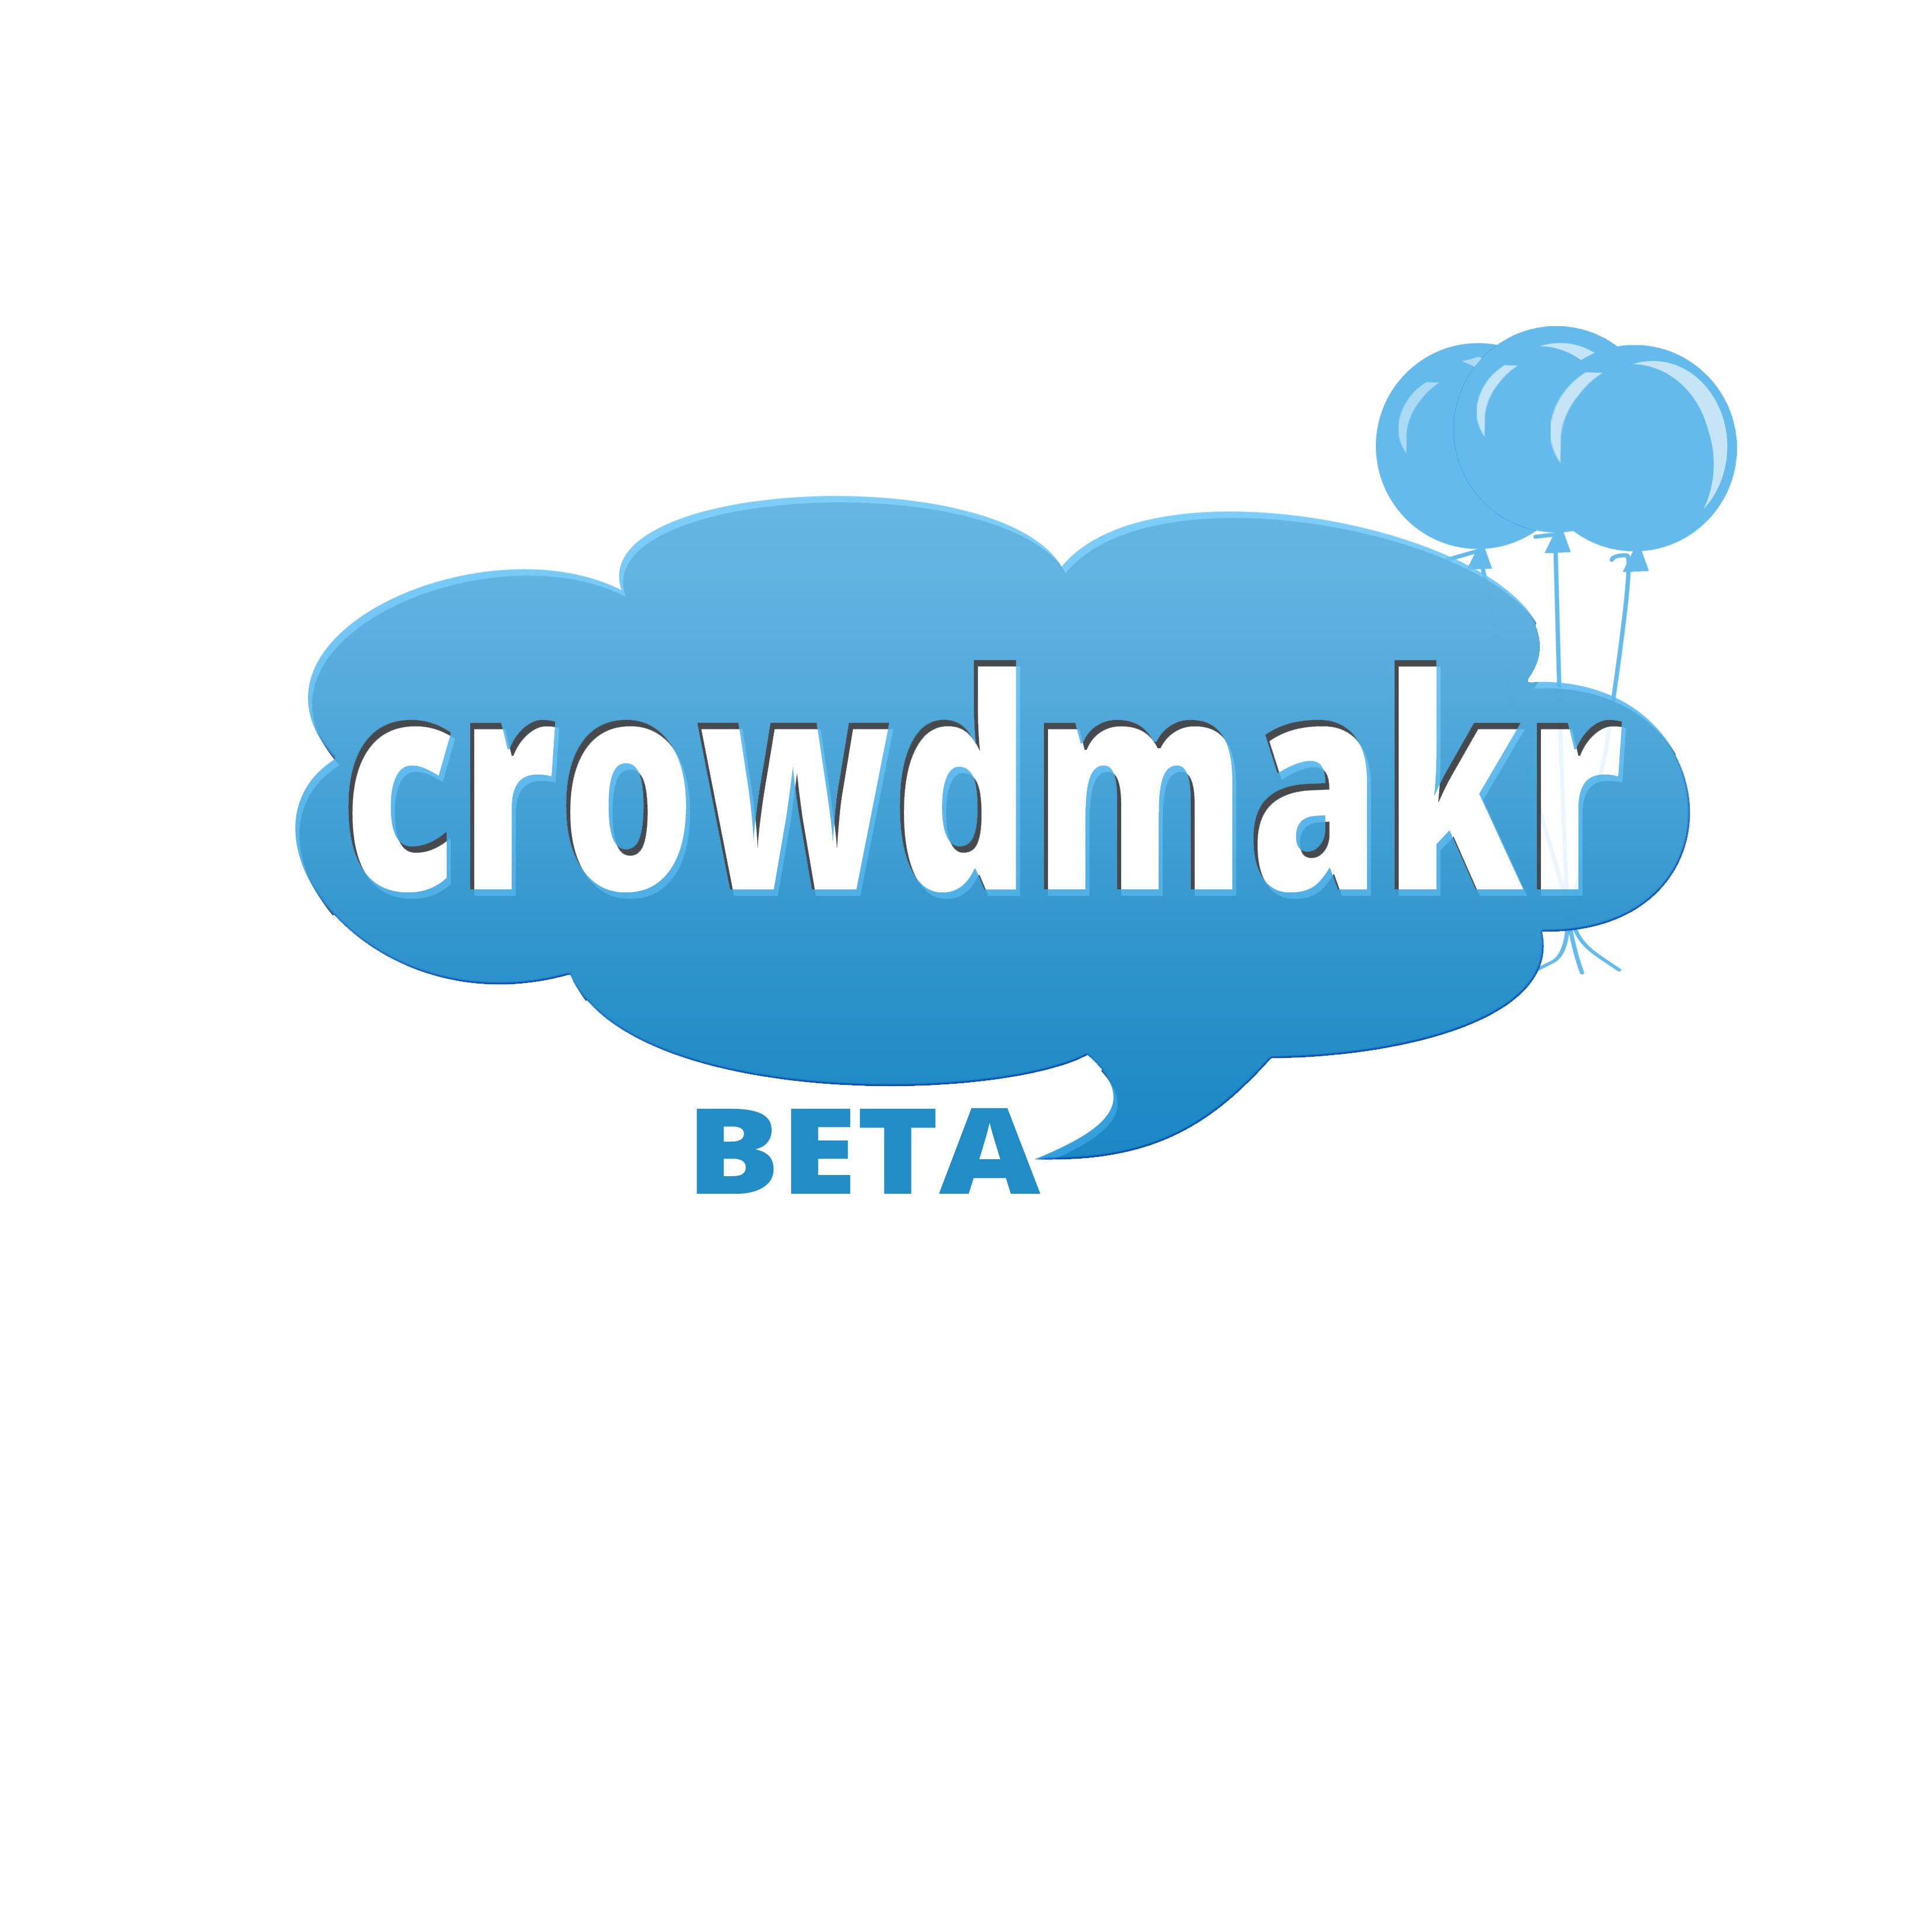 Logo Design by Allan Esclamado - Entry No. 37 in the Logo Design Contest Unique Logo Design Wanted for crowdmakr.